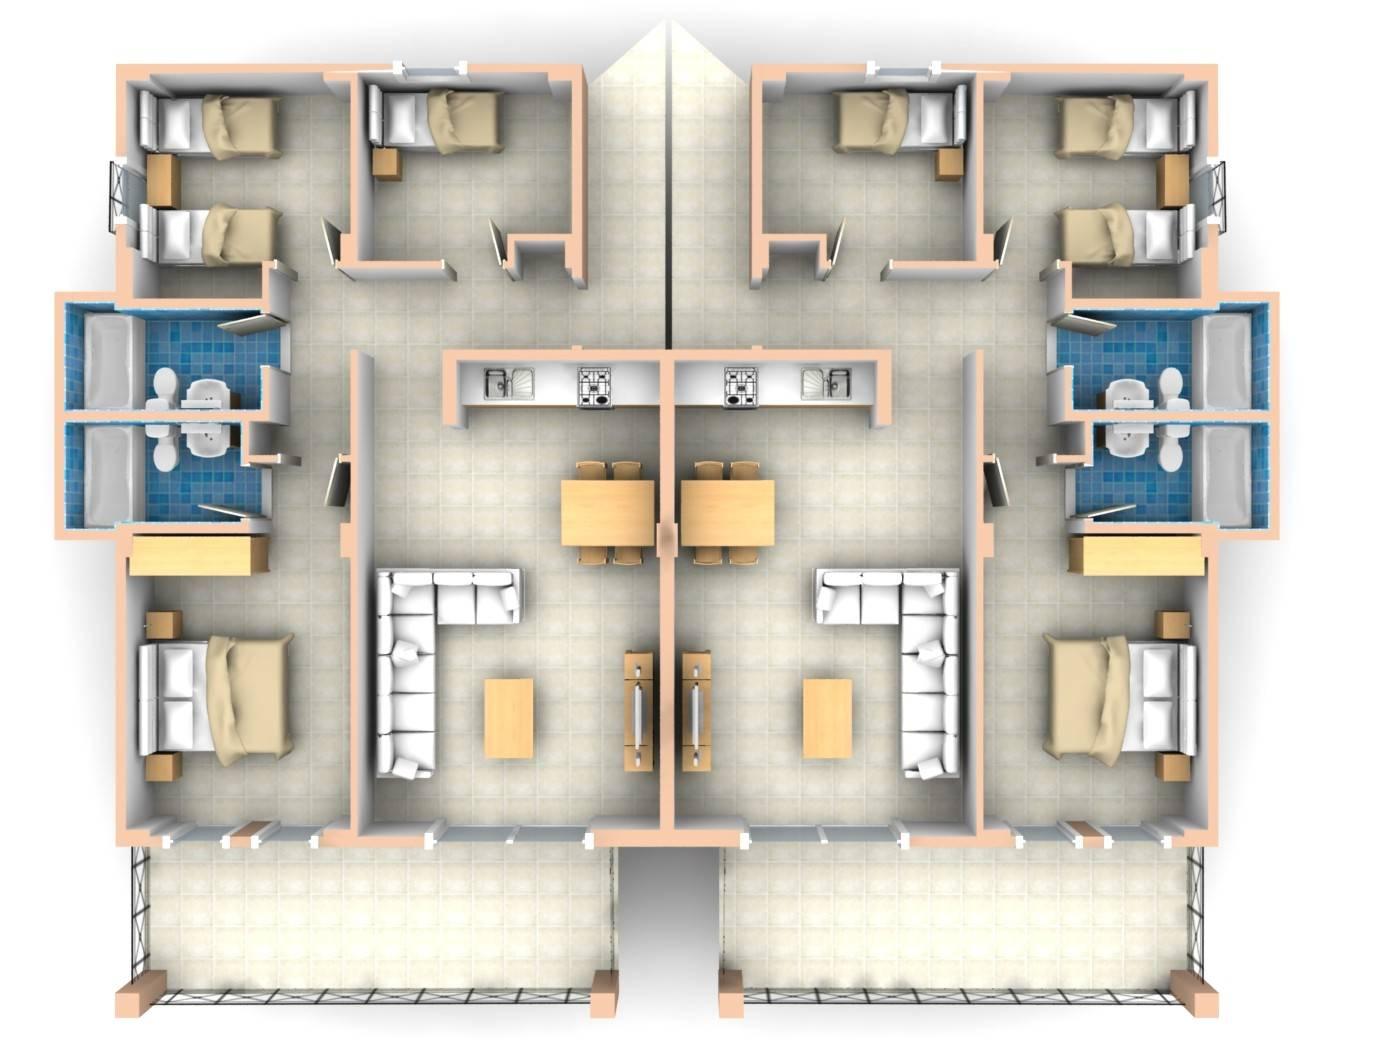 26 Decorative 3 Bedroom Apartment Plan House Plans